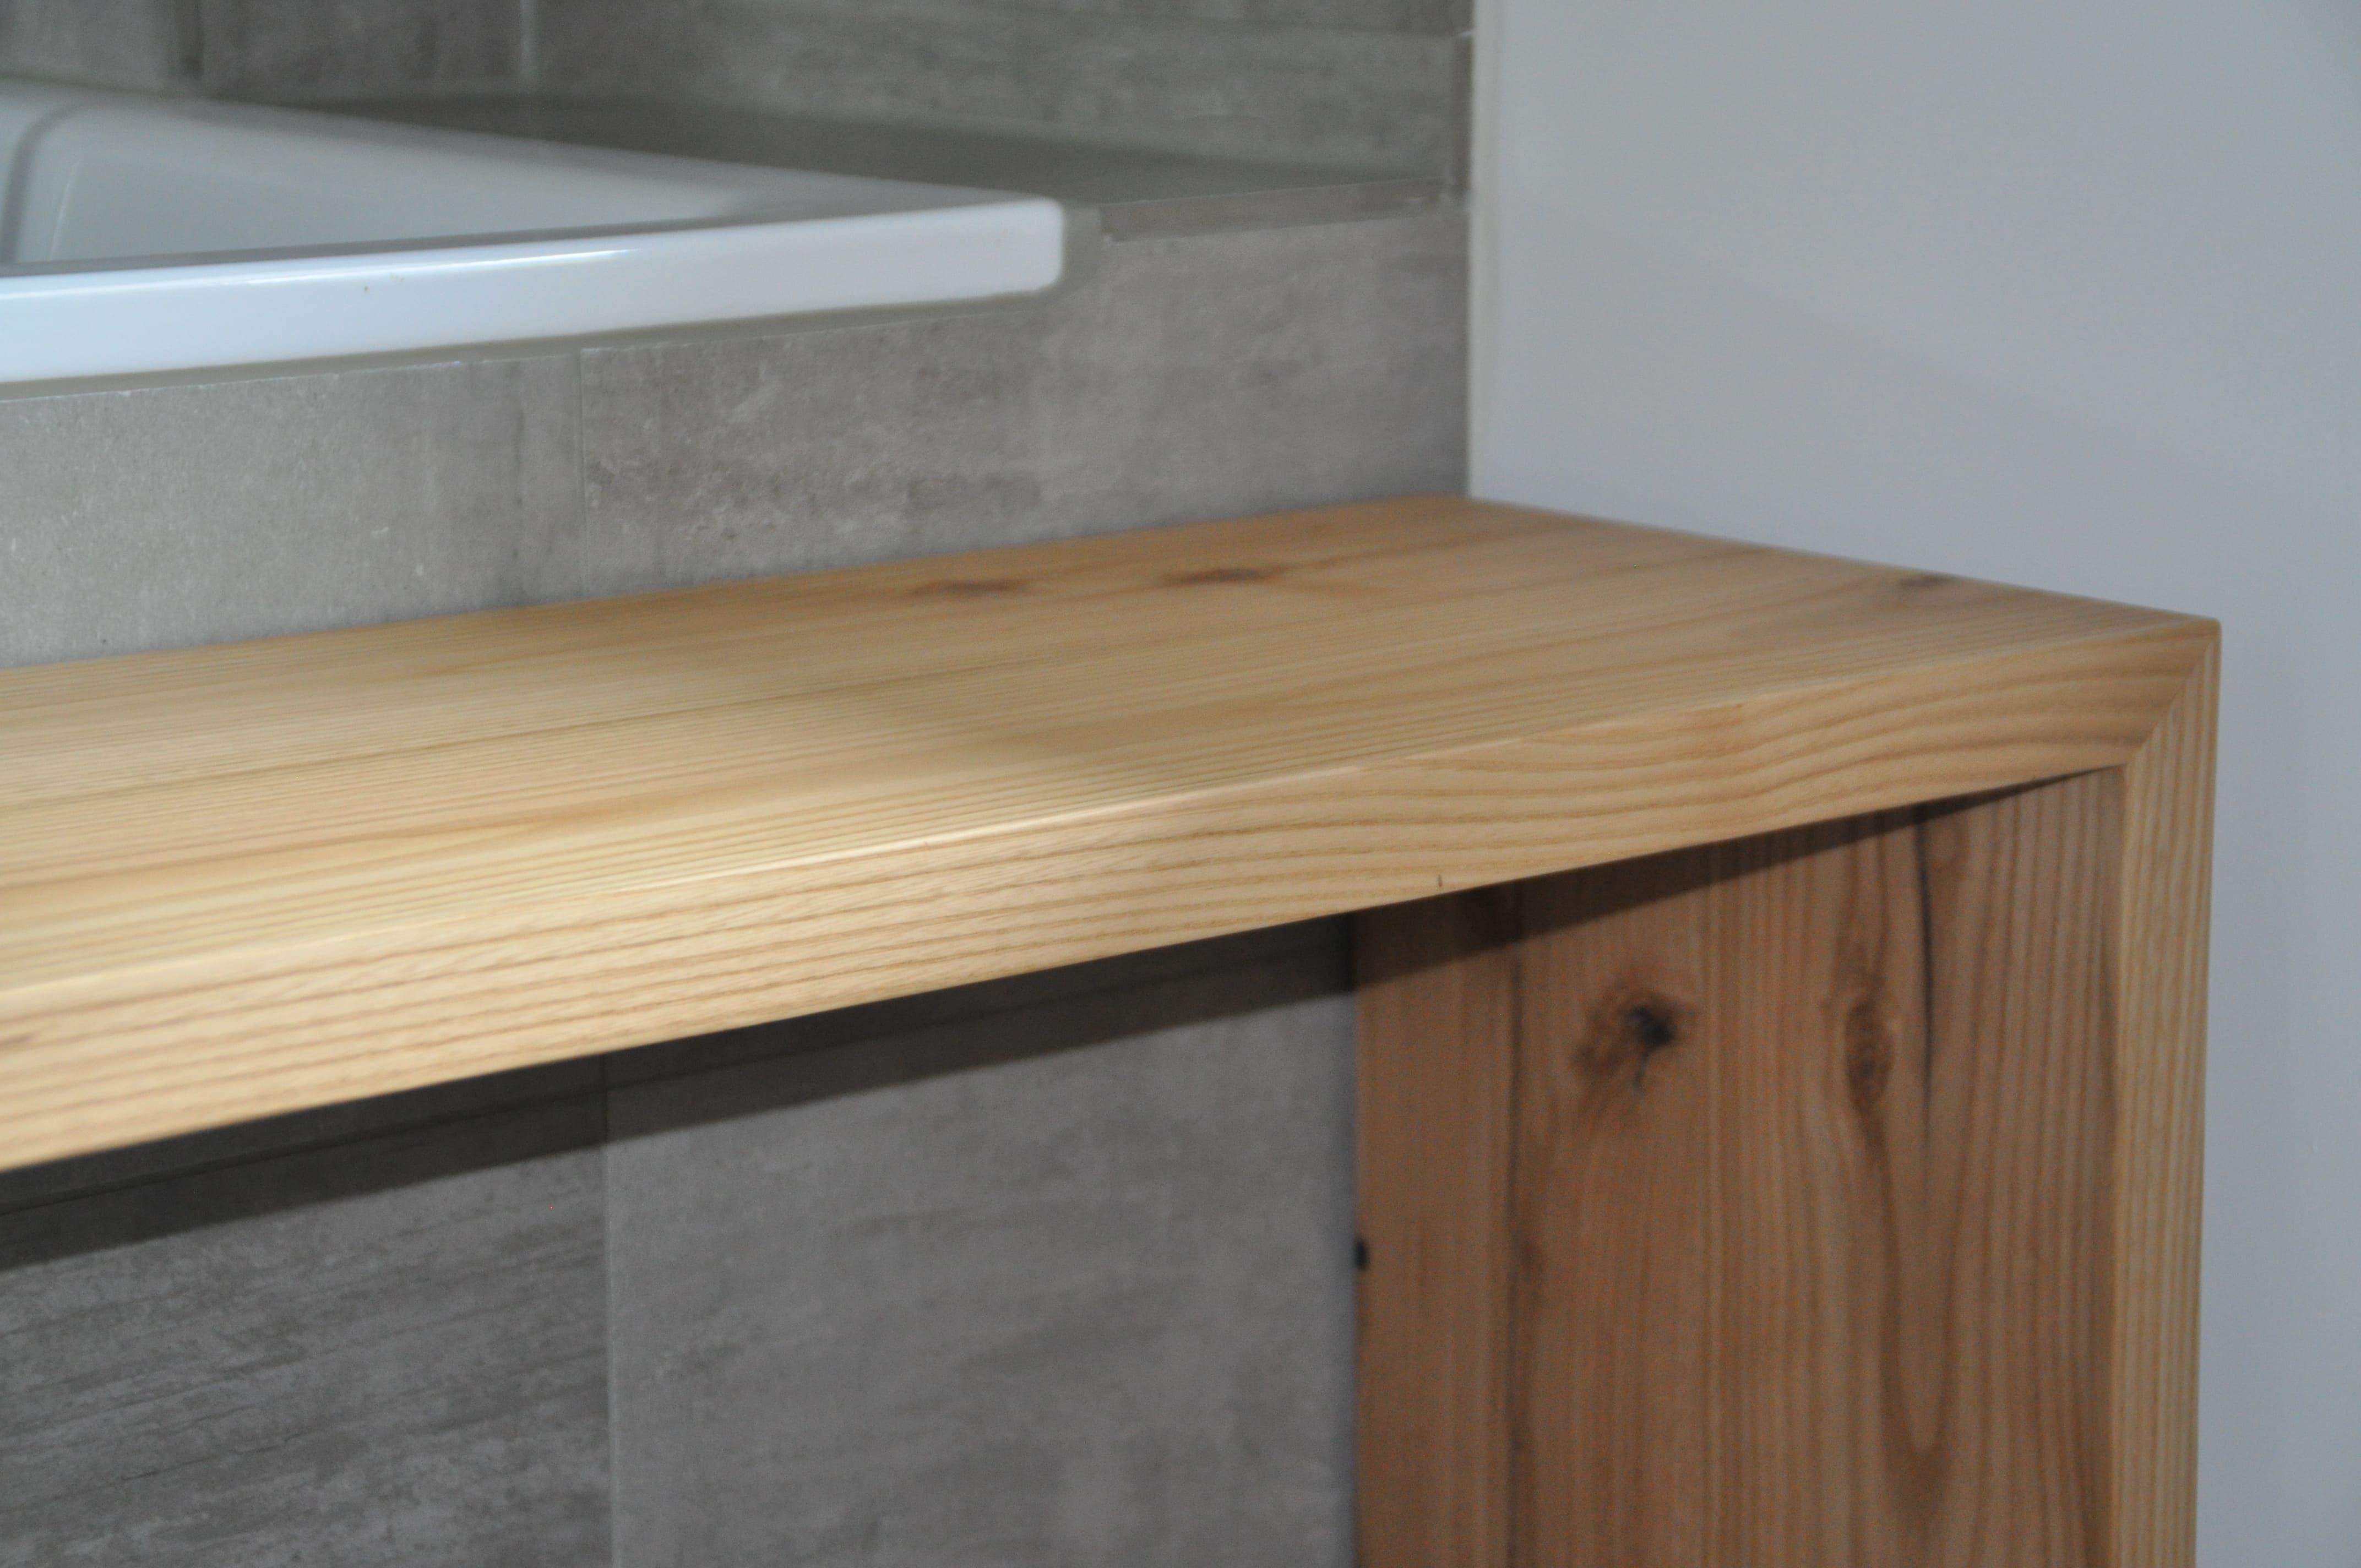 Bank Bad Badezimmer Badewanne Holz